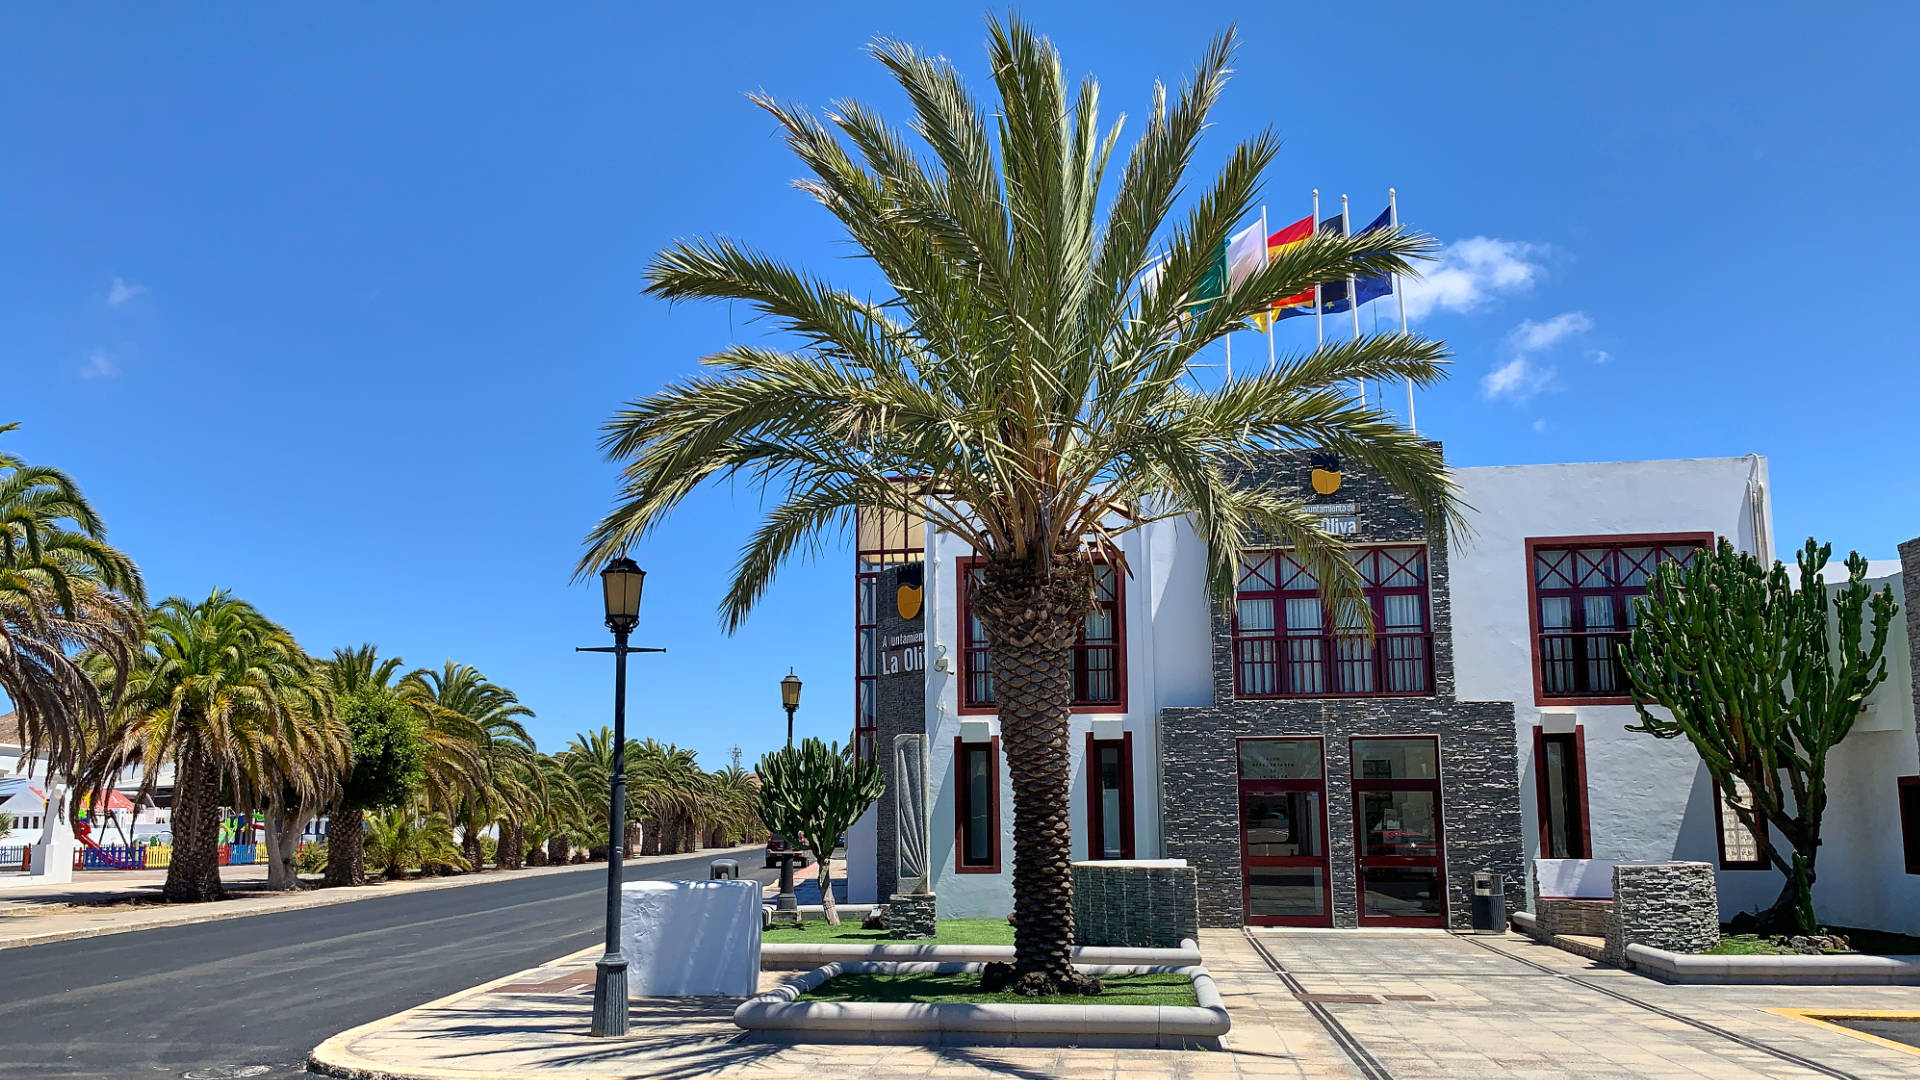 Das Ayuntamienteo von La Oliva Fuerteventura.